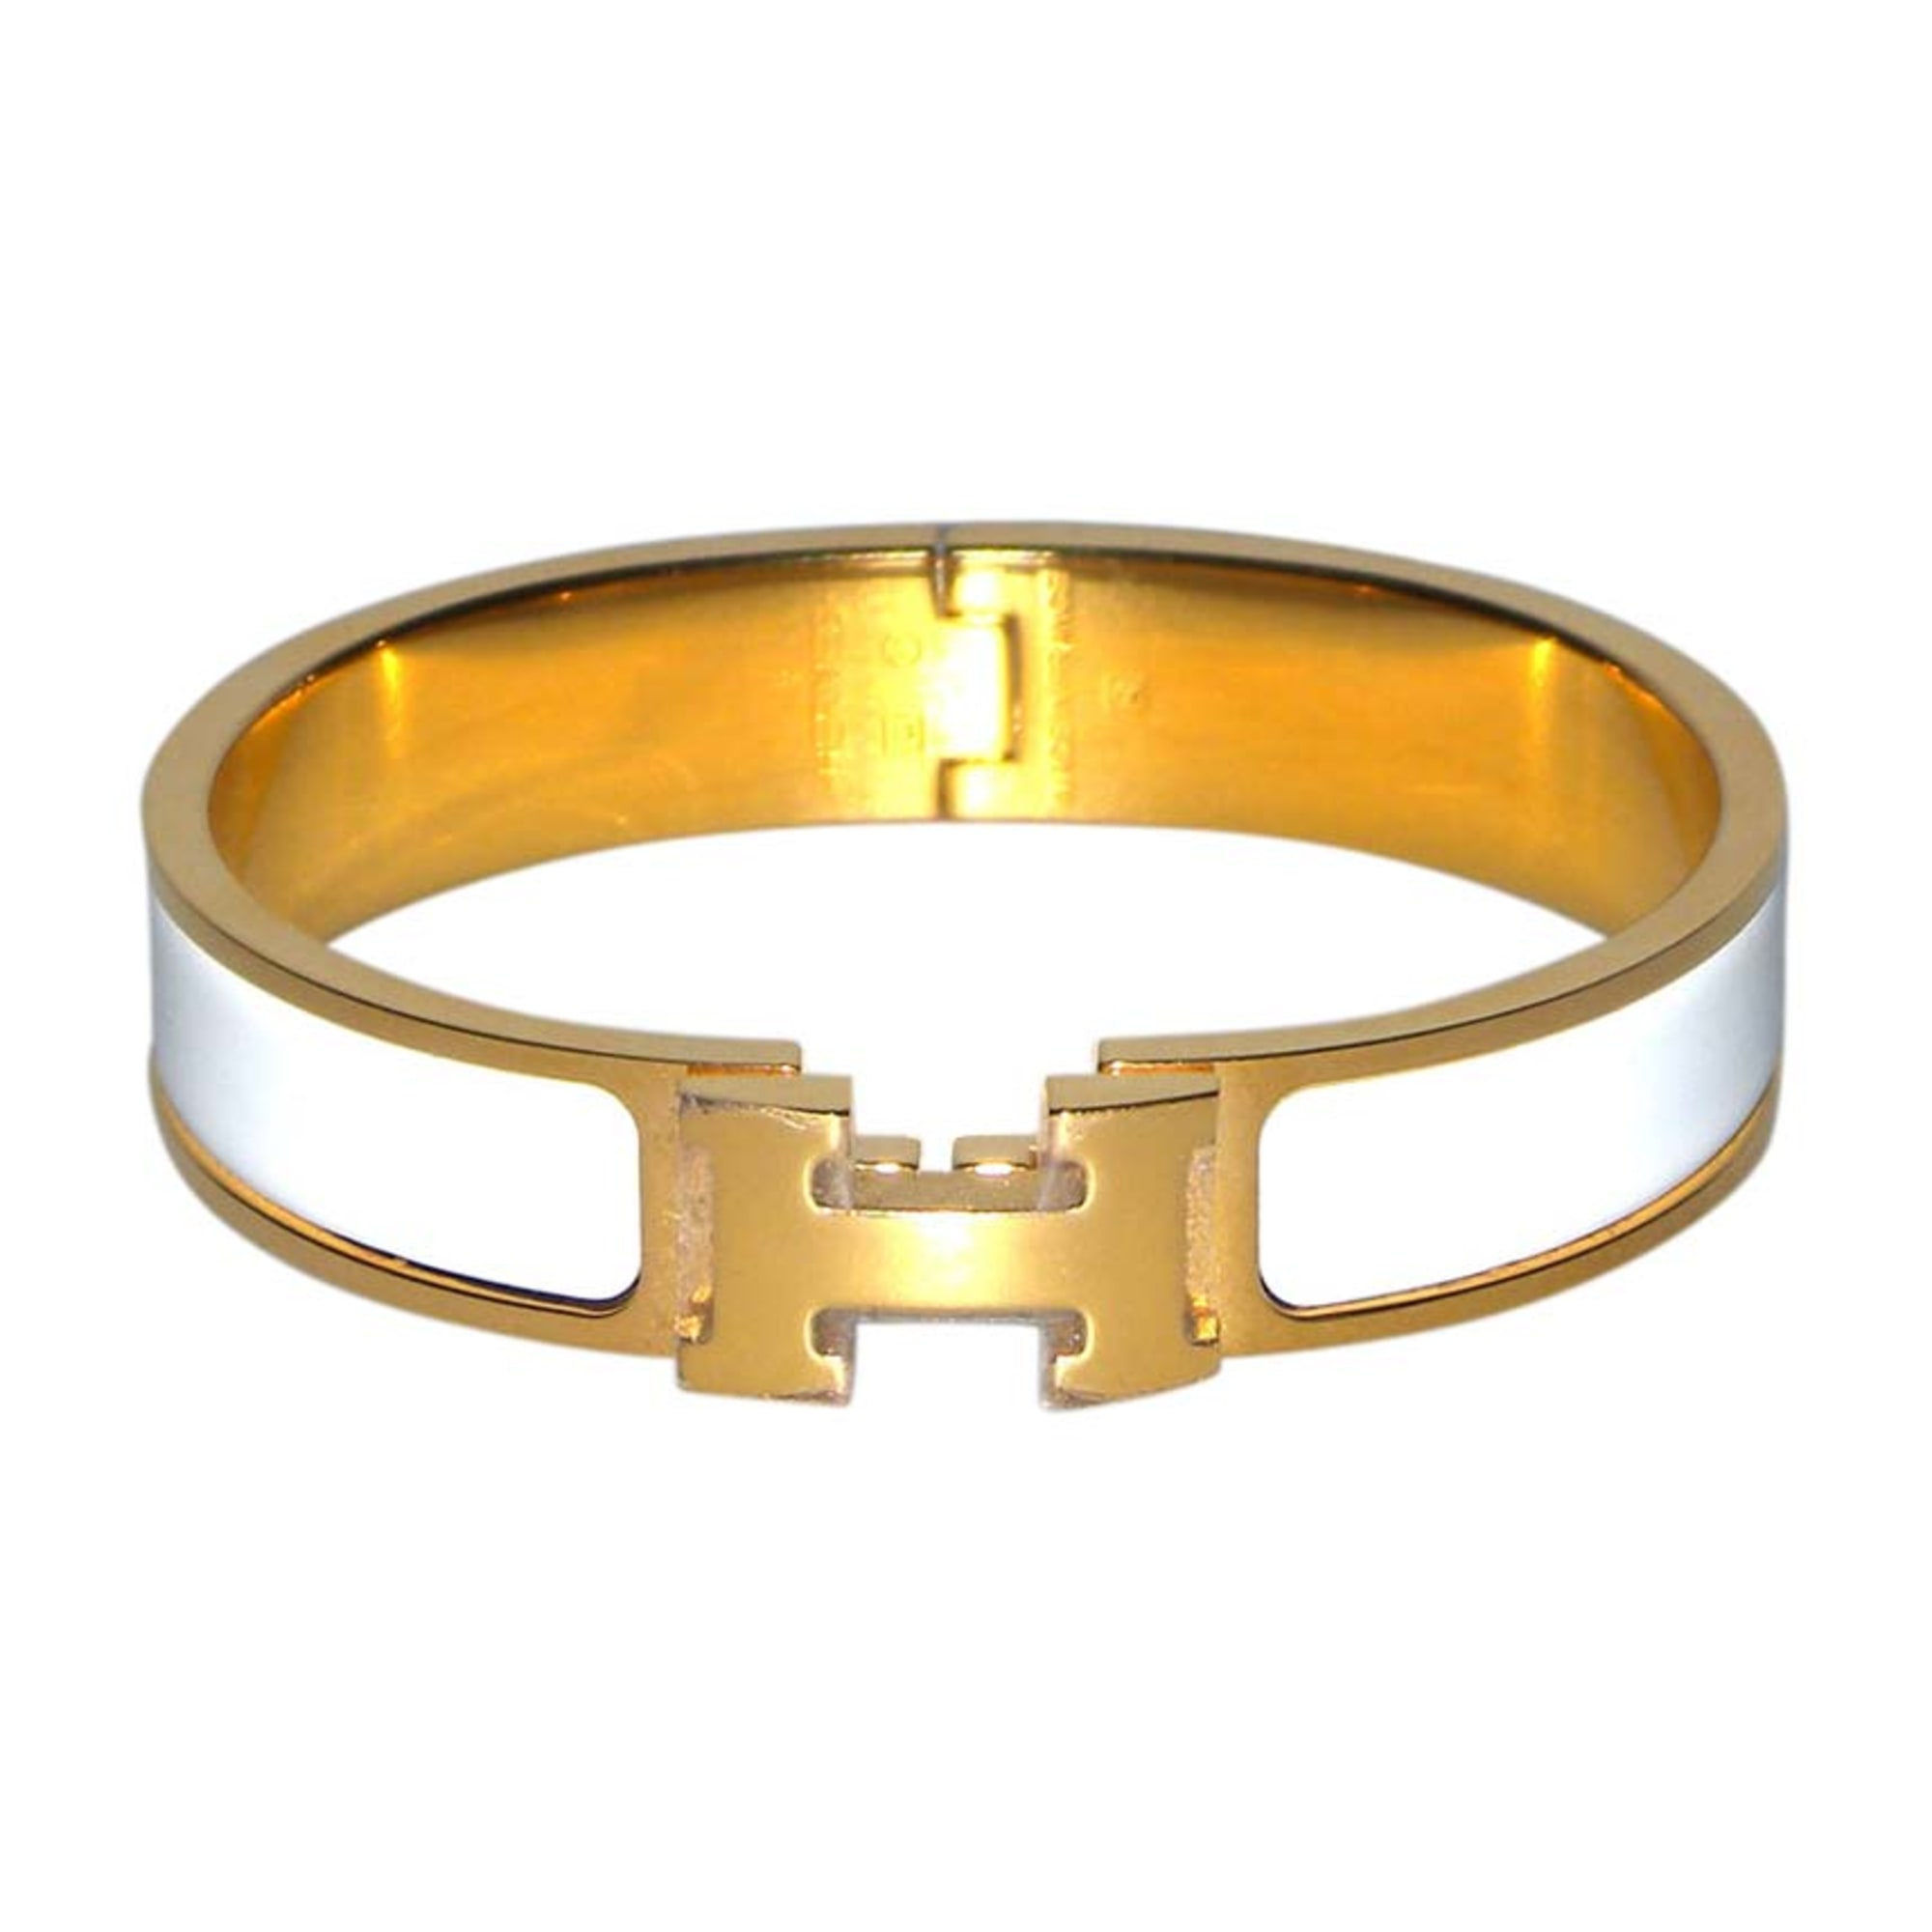 fd30cdfeafa7 Bracelet HERMÈS clic h blanc vendu par Sandy28400 - 5867103